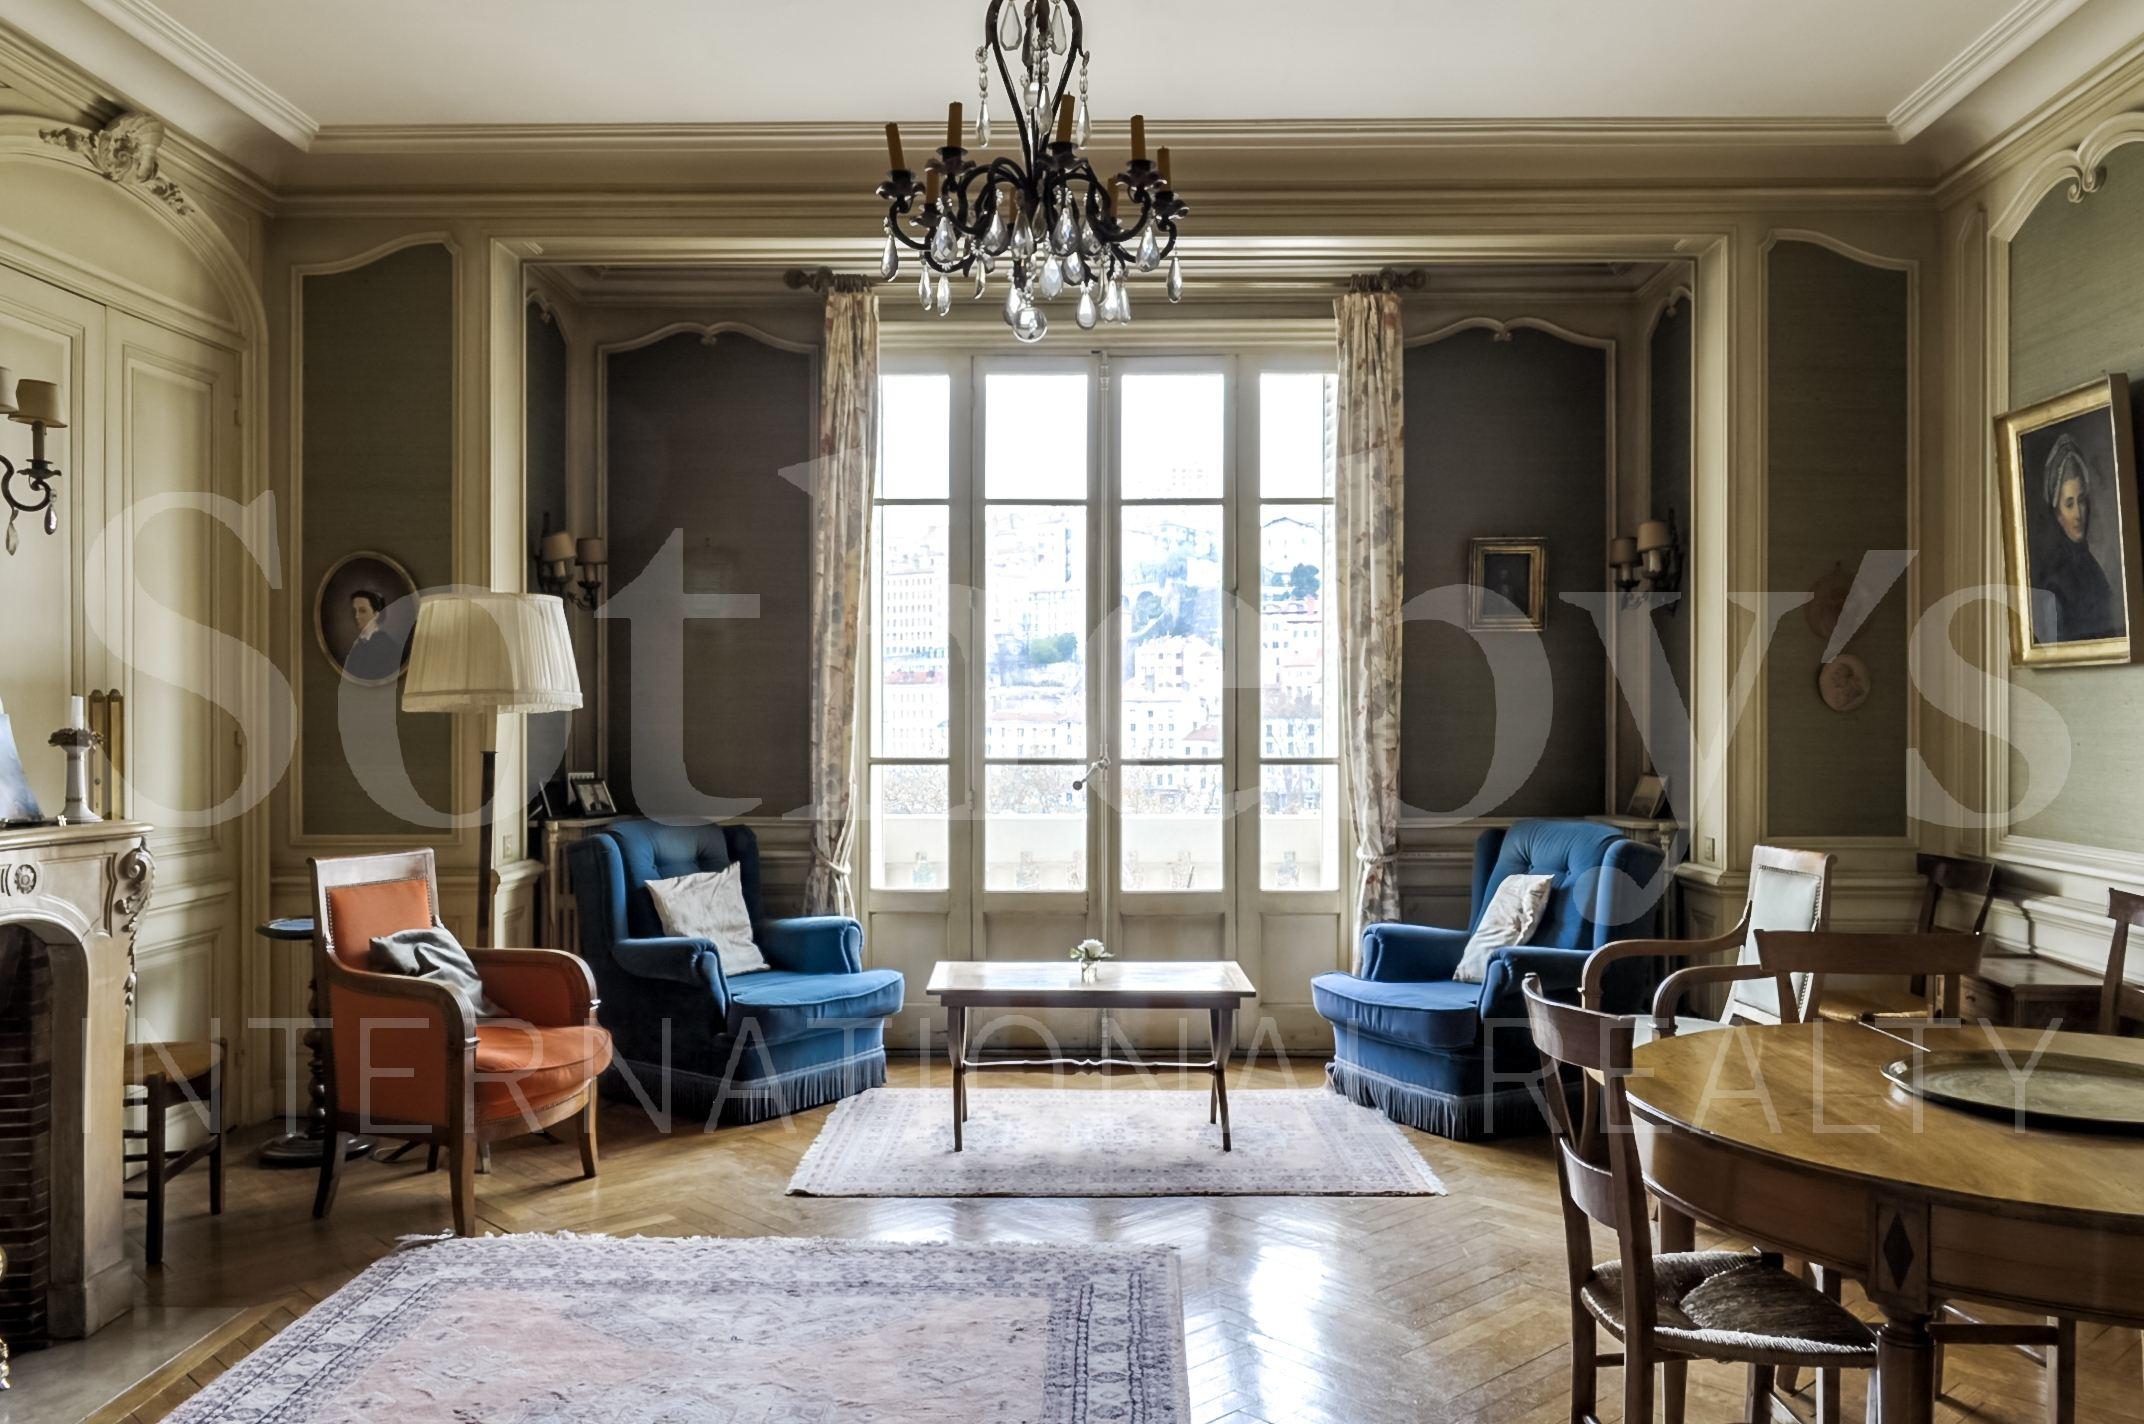 Apartment for Sale at LYON 6 ème- METRO FOCH Lyon, Rhone-Alpes, 69006 France